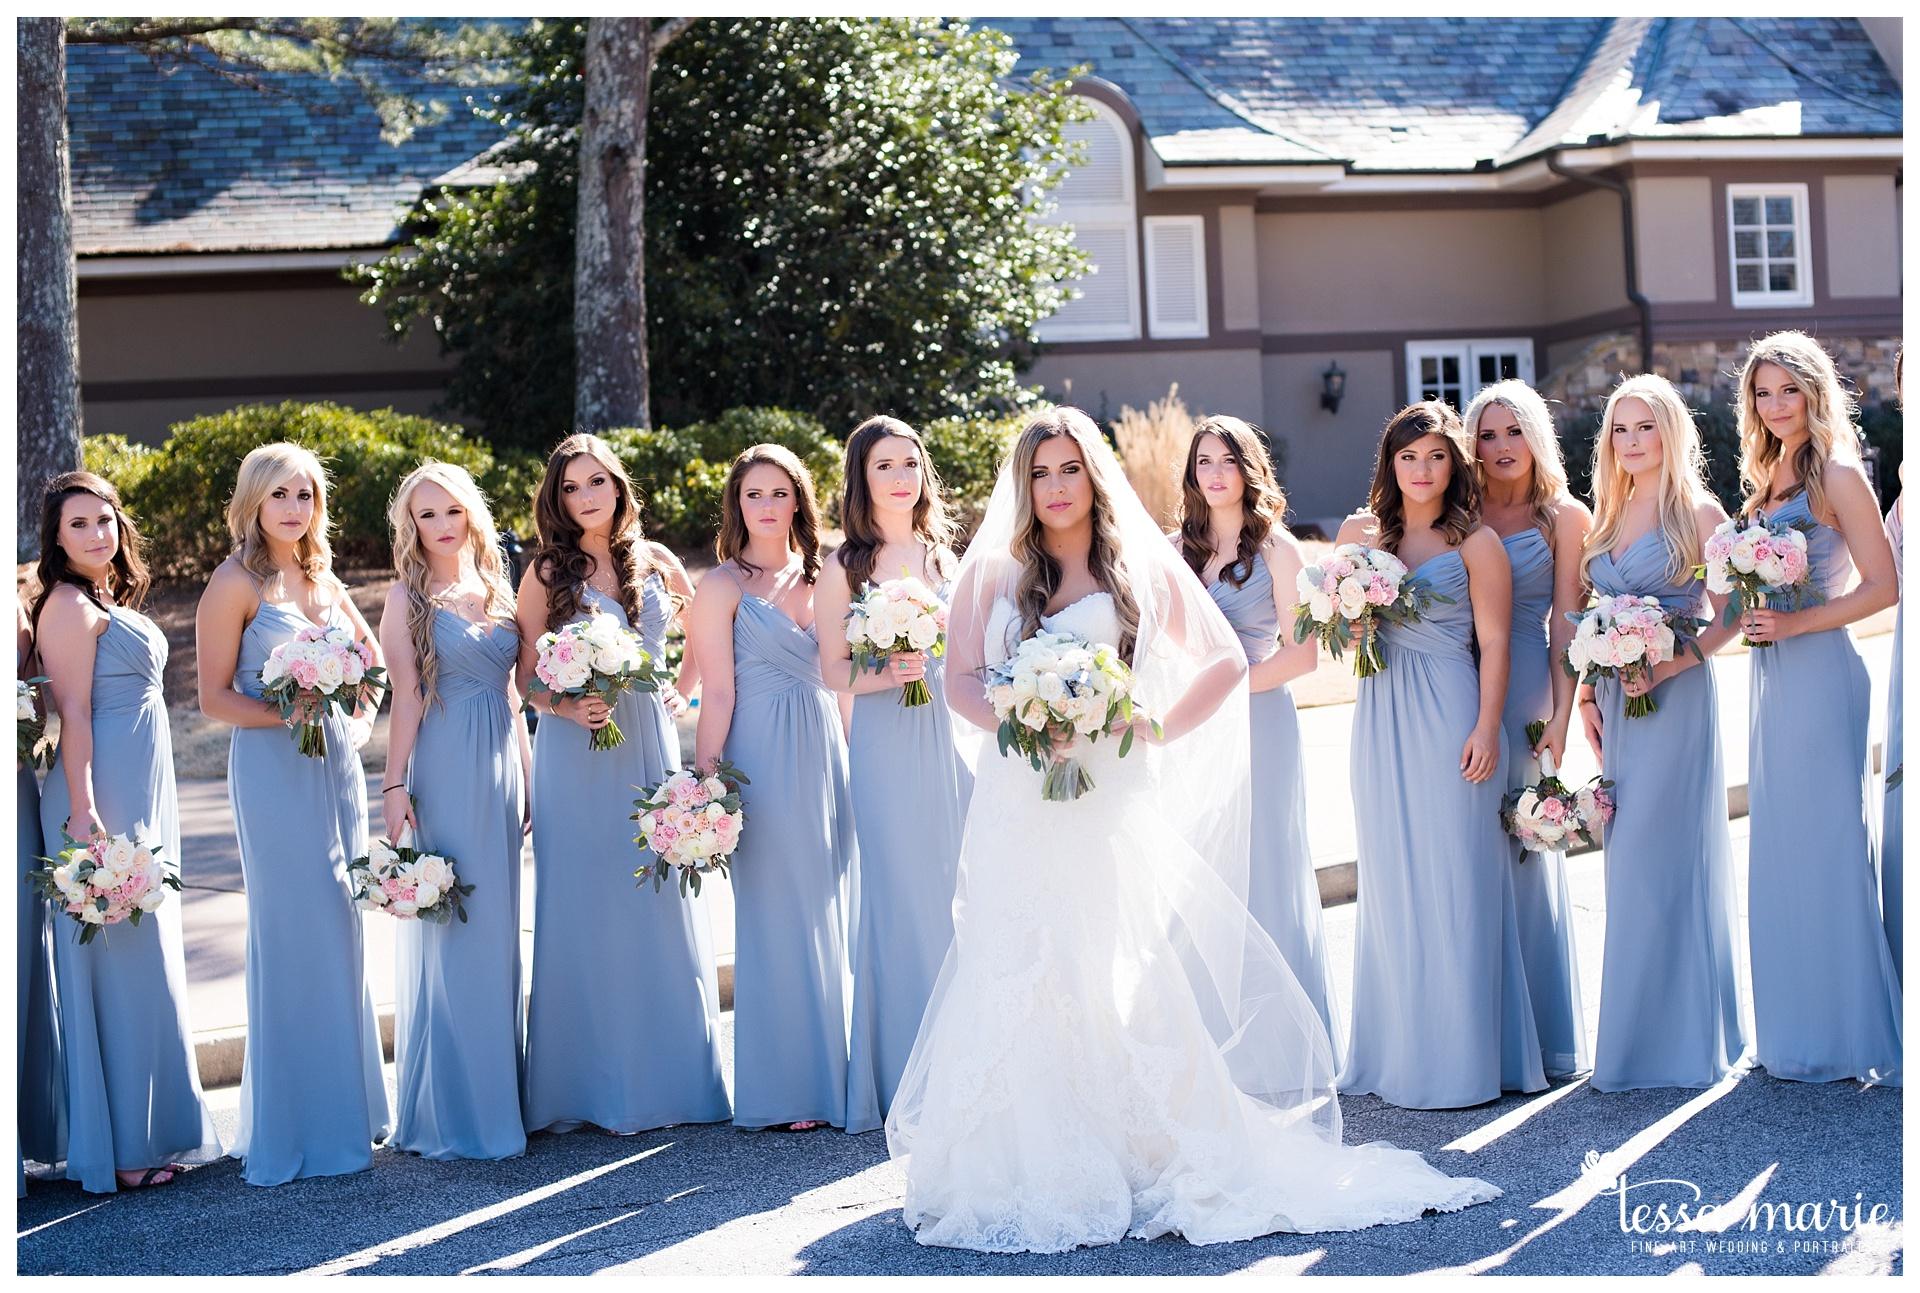 tessa_marie_weddings_legacy_story_focused_wedding_pictures_atlanta_wedding_photographer_0096